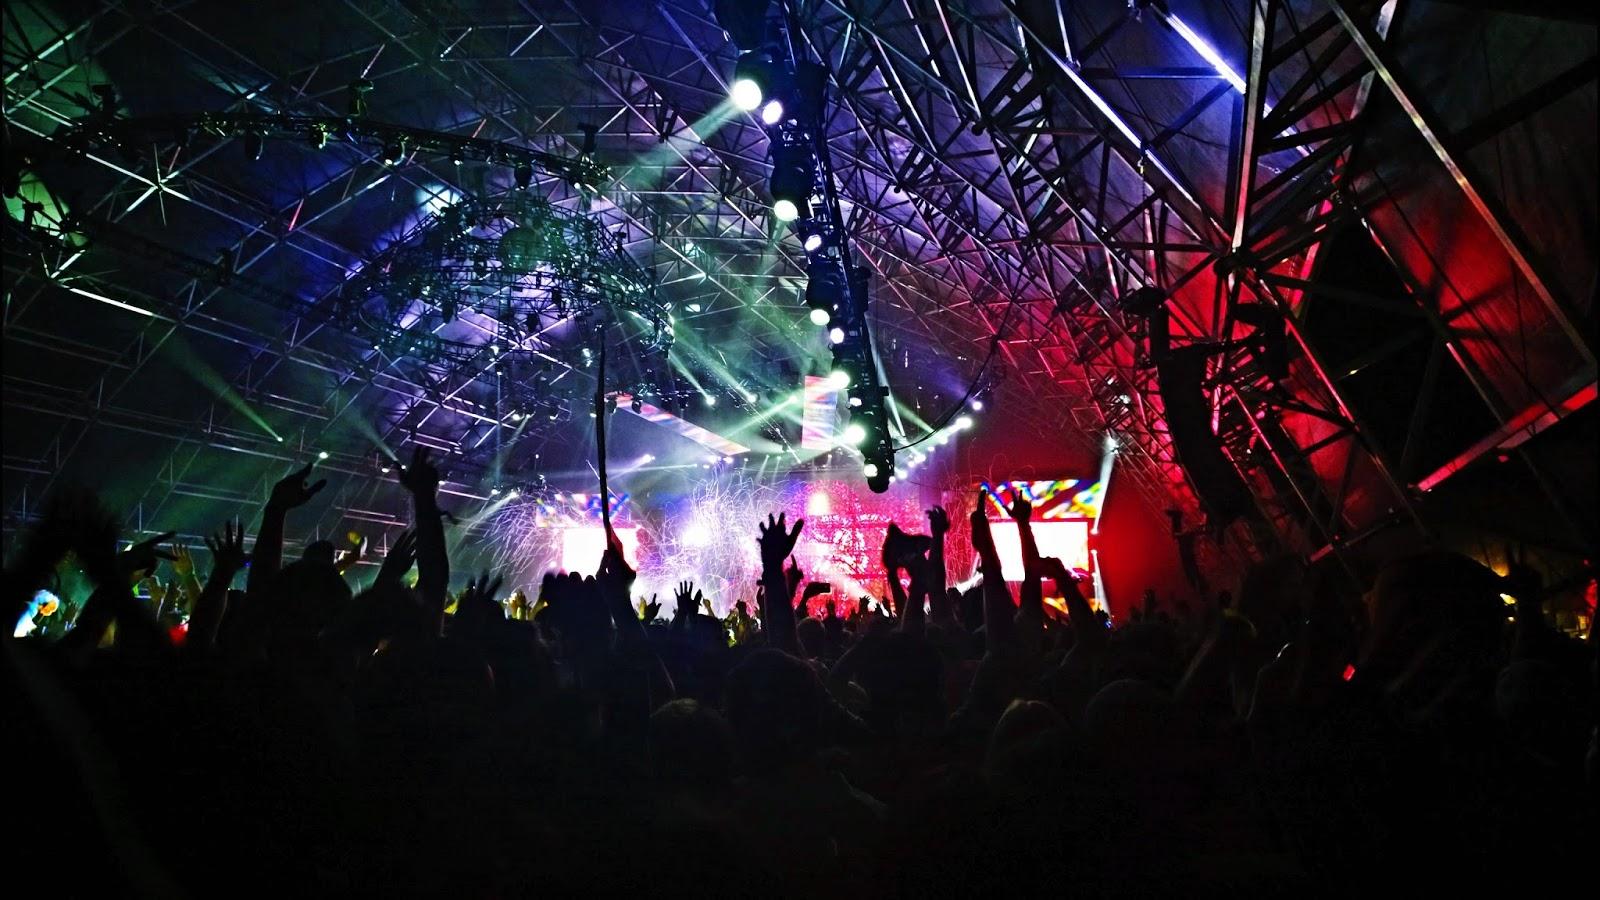 Finding the next festival headliner using Big Data